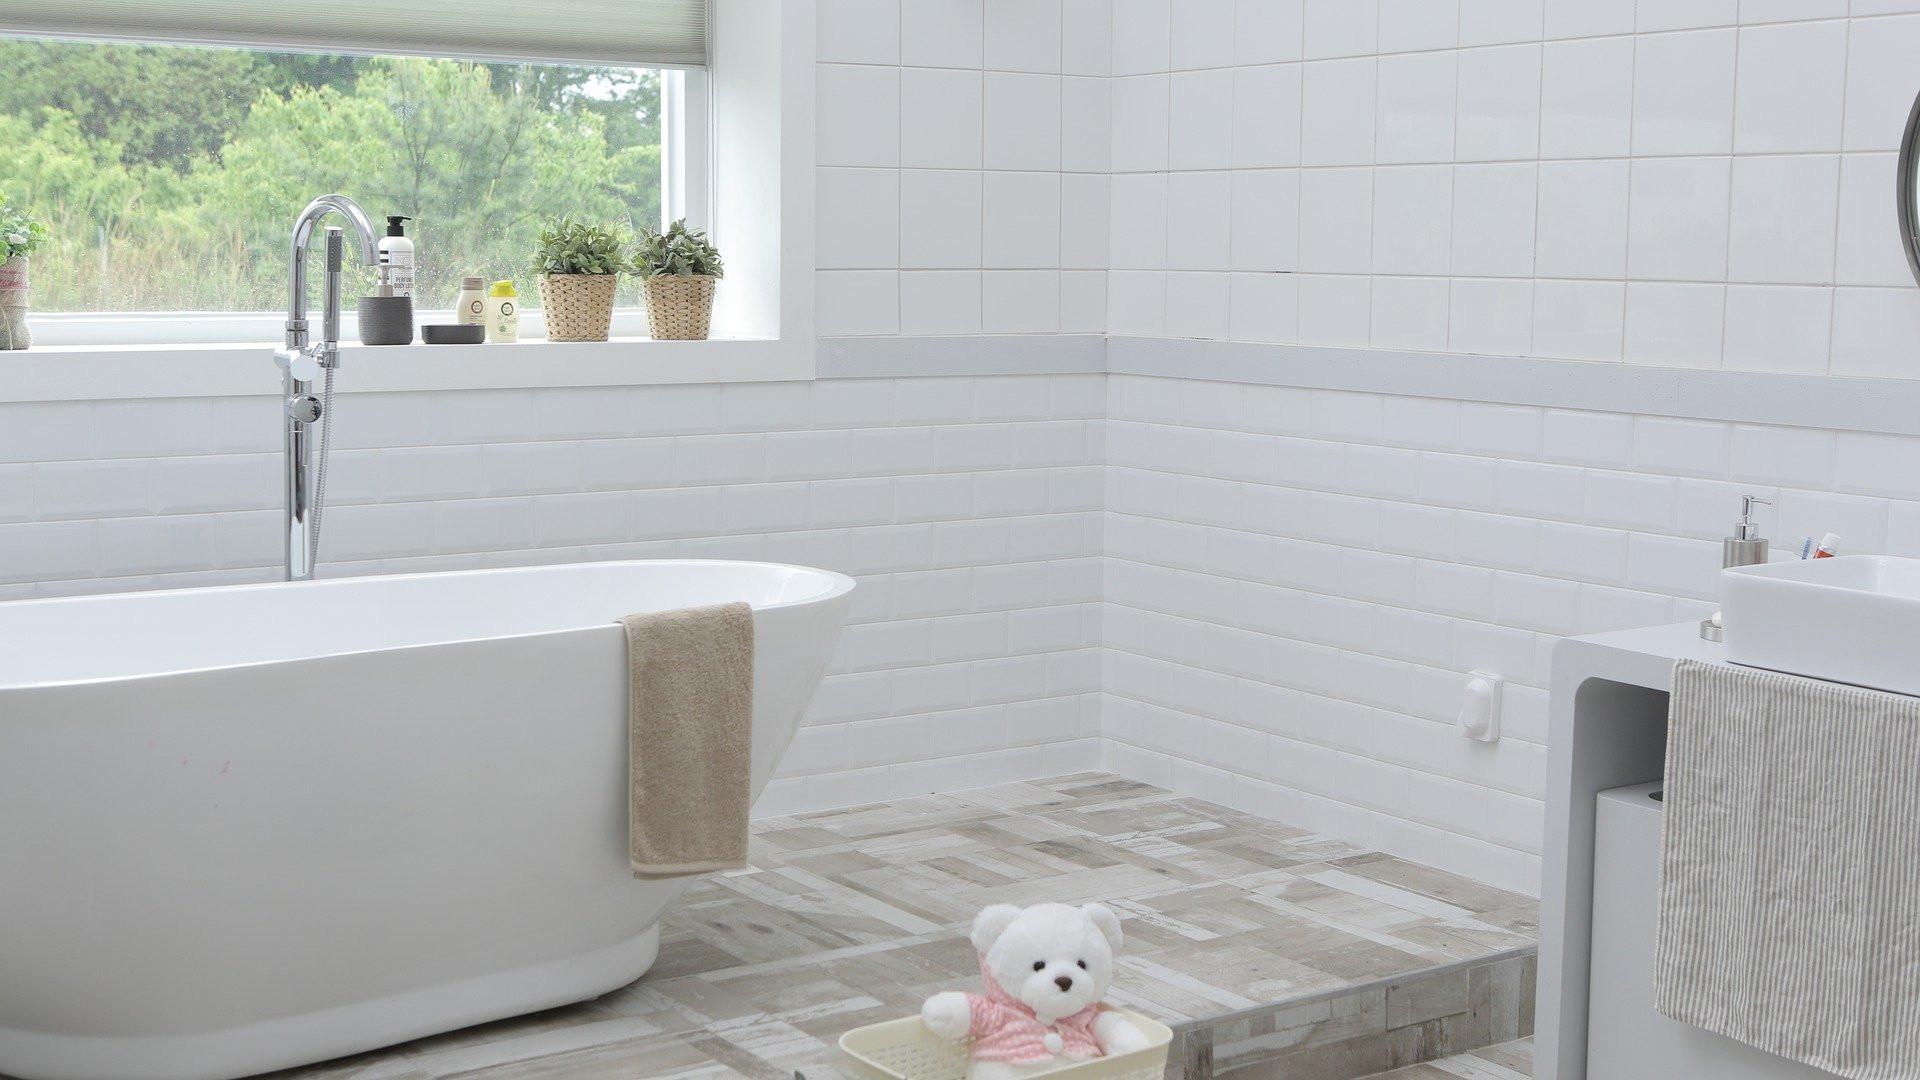 Déco : réorganiser efficacement sa salle de bain